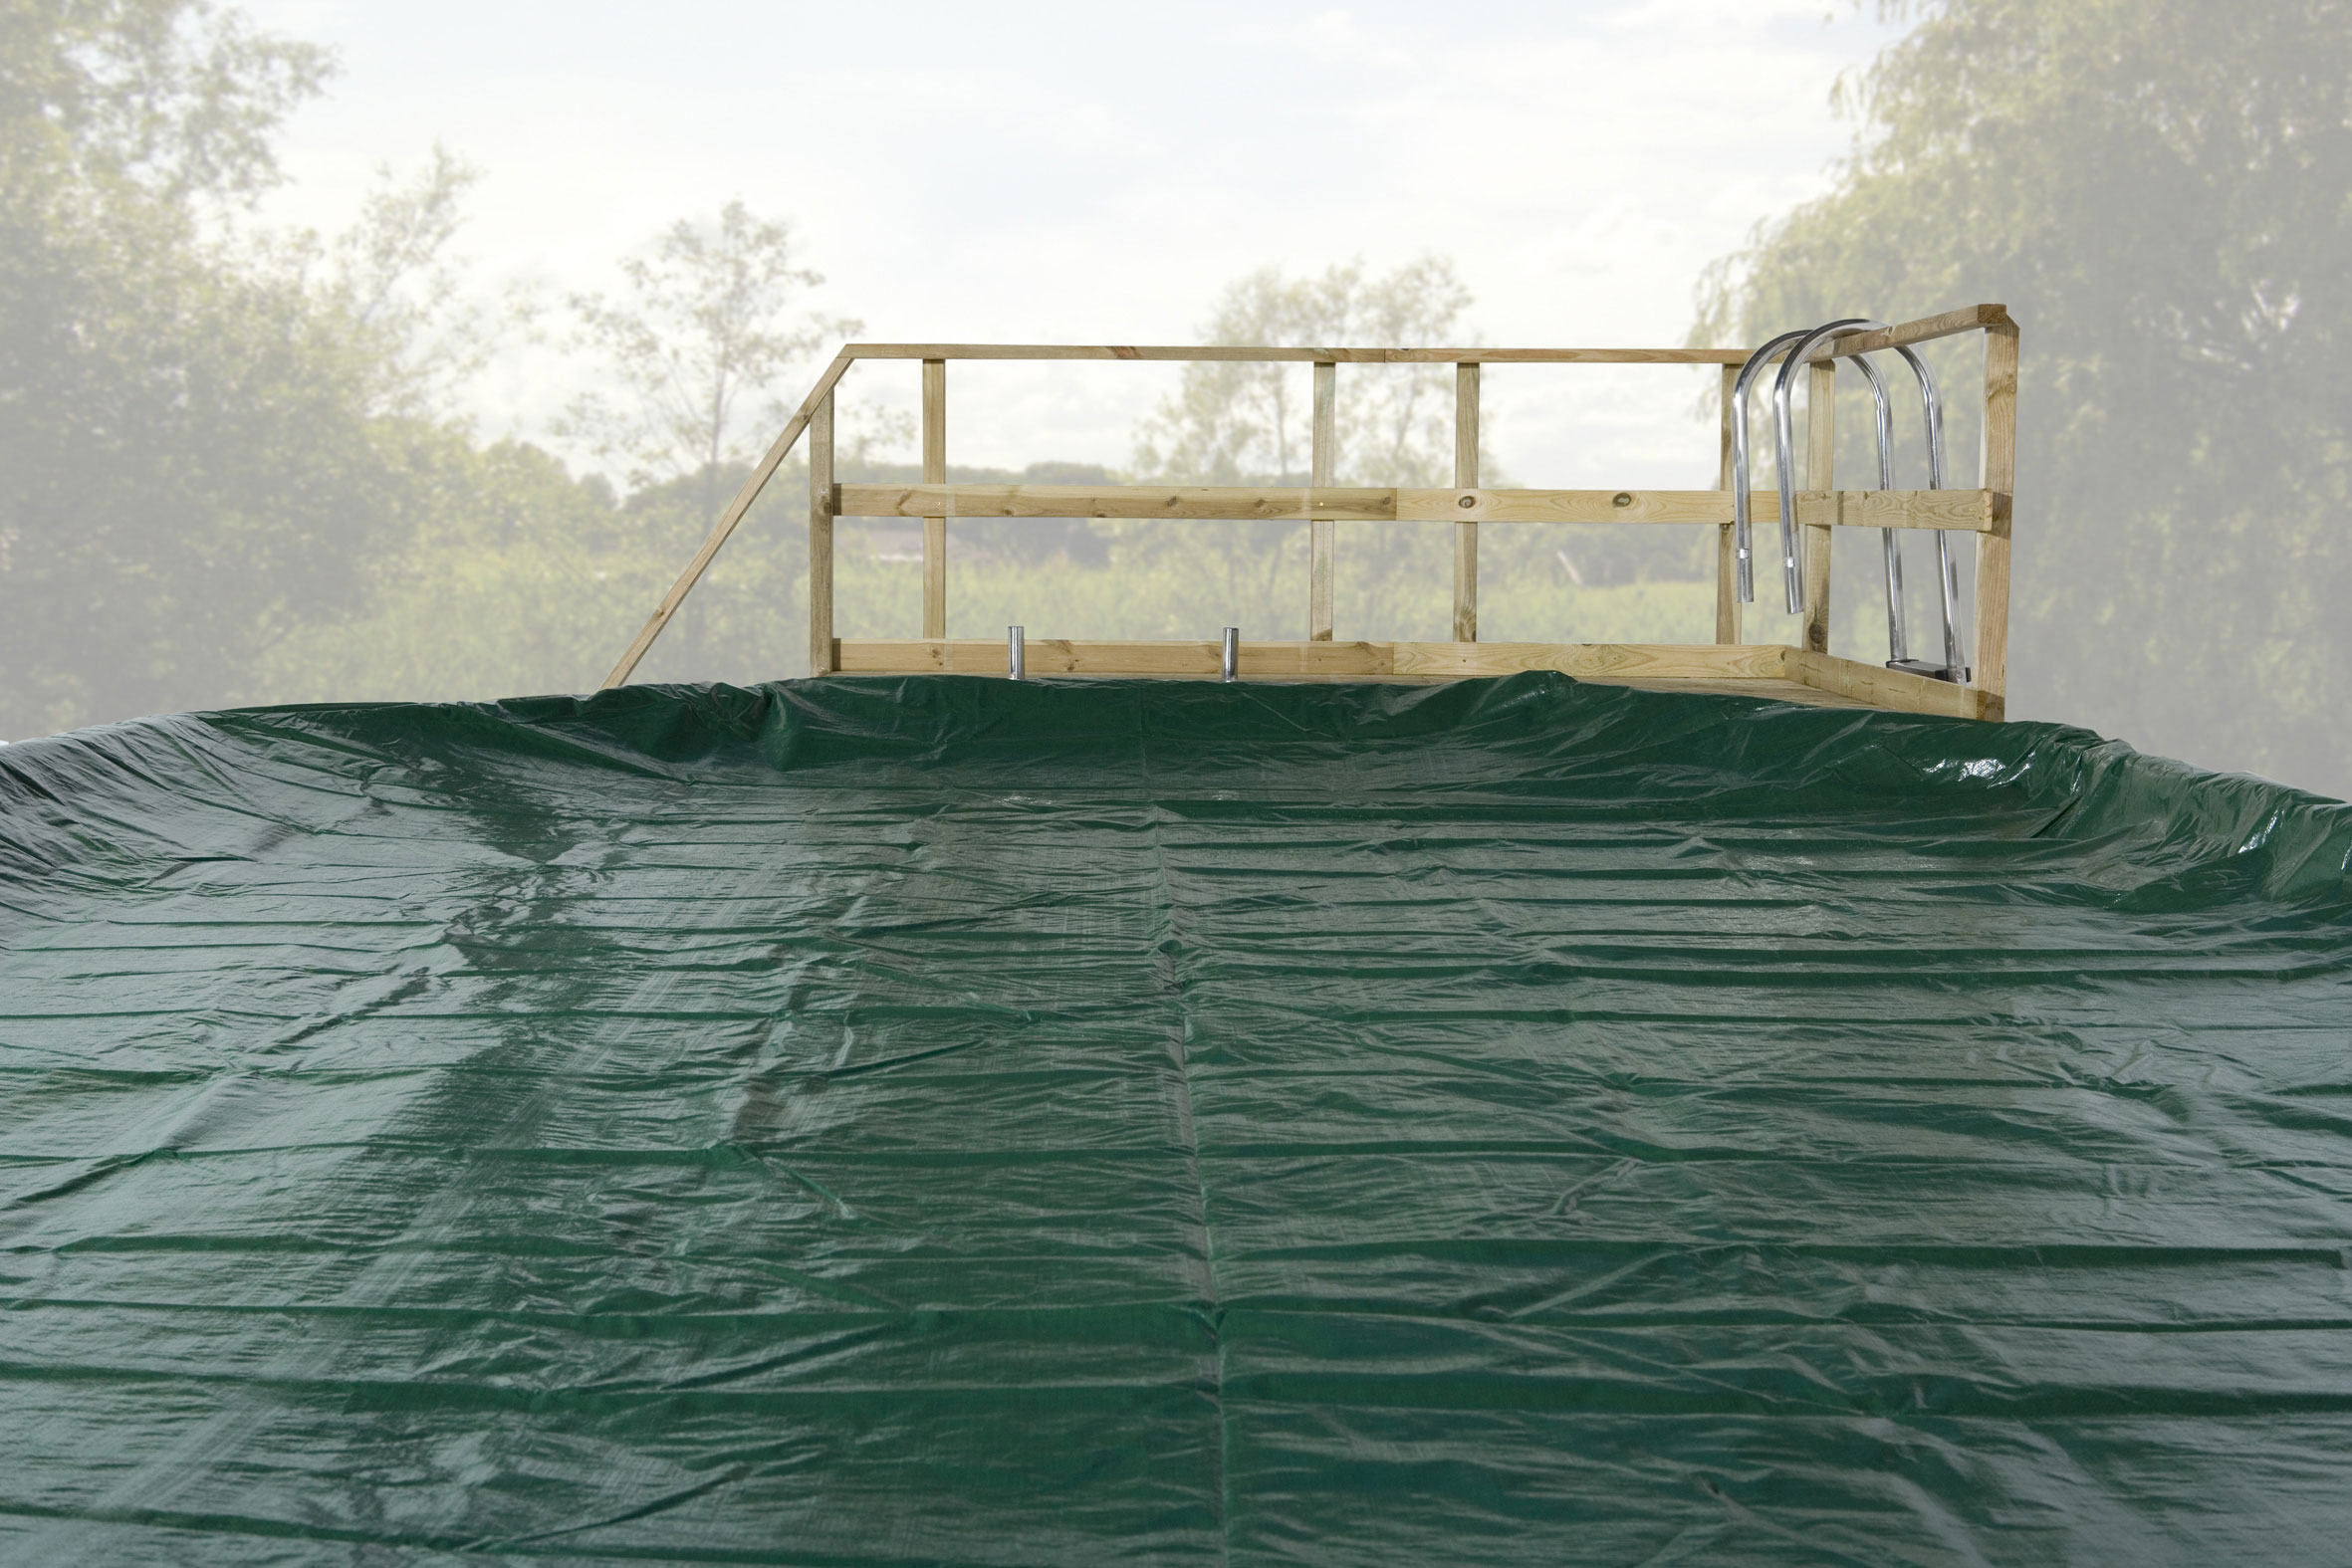 Abdeckplane für Weka Pool 594 Gr.1 grün 714x376cm Bild 1